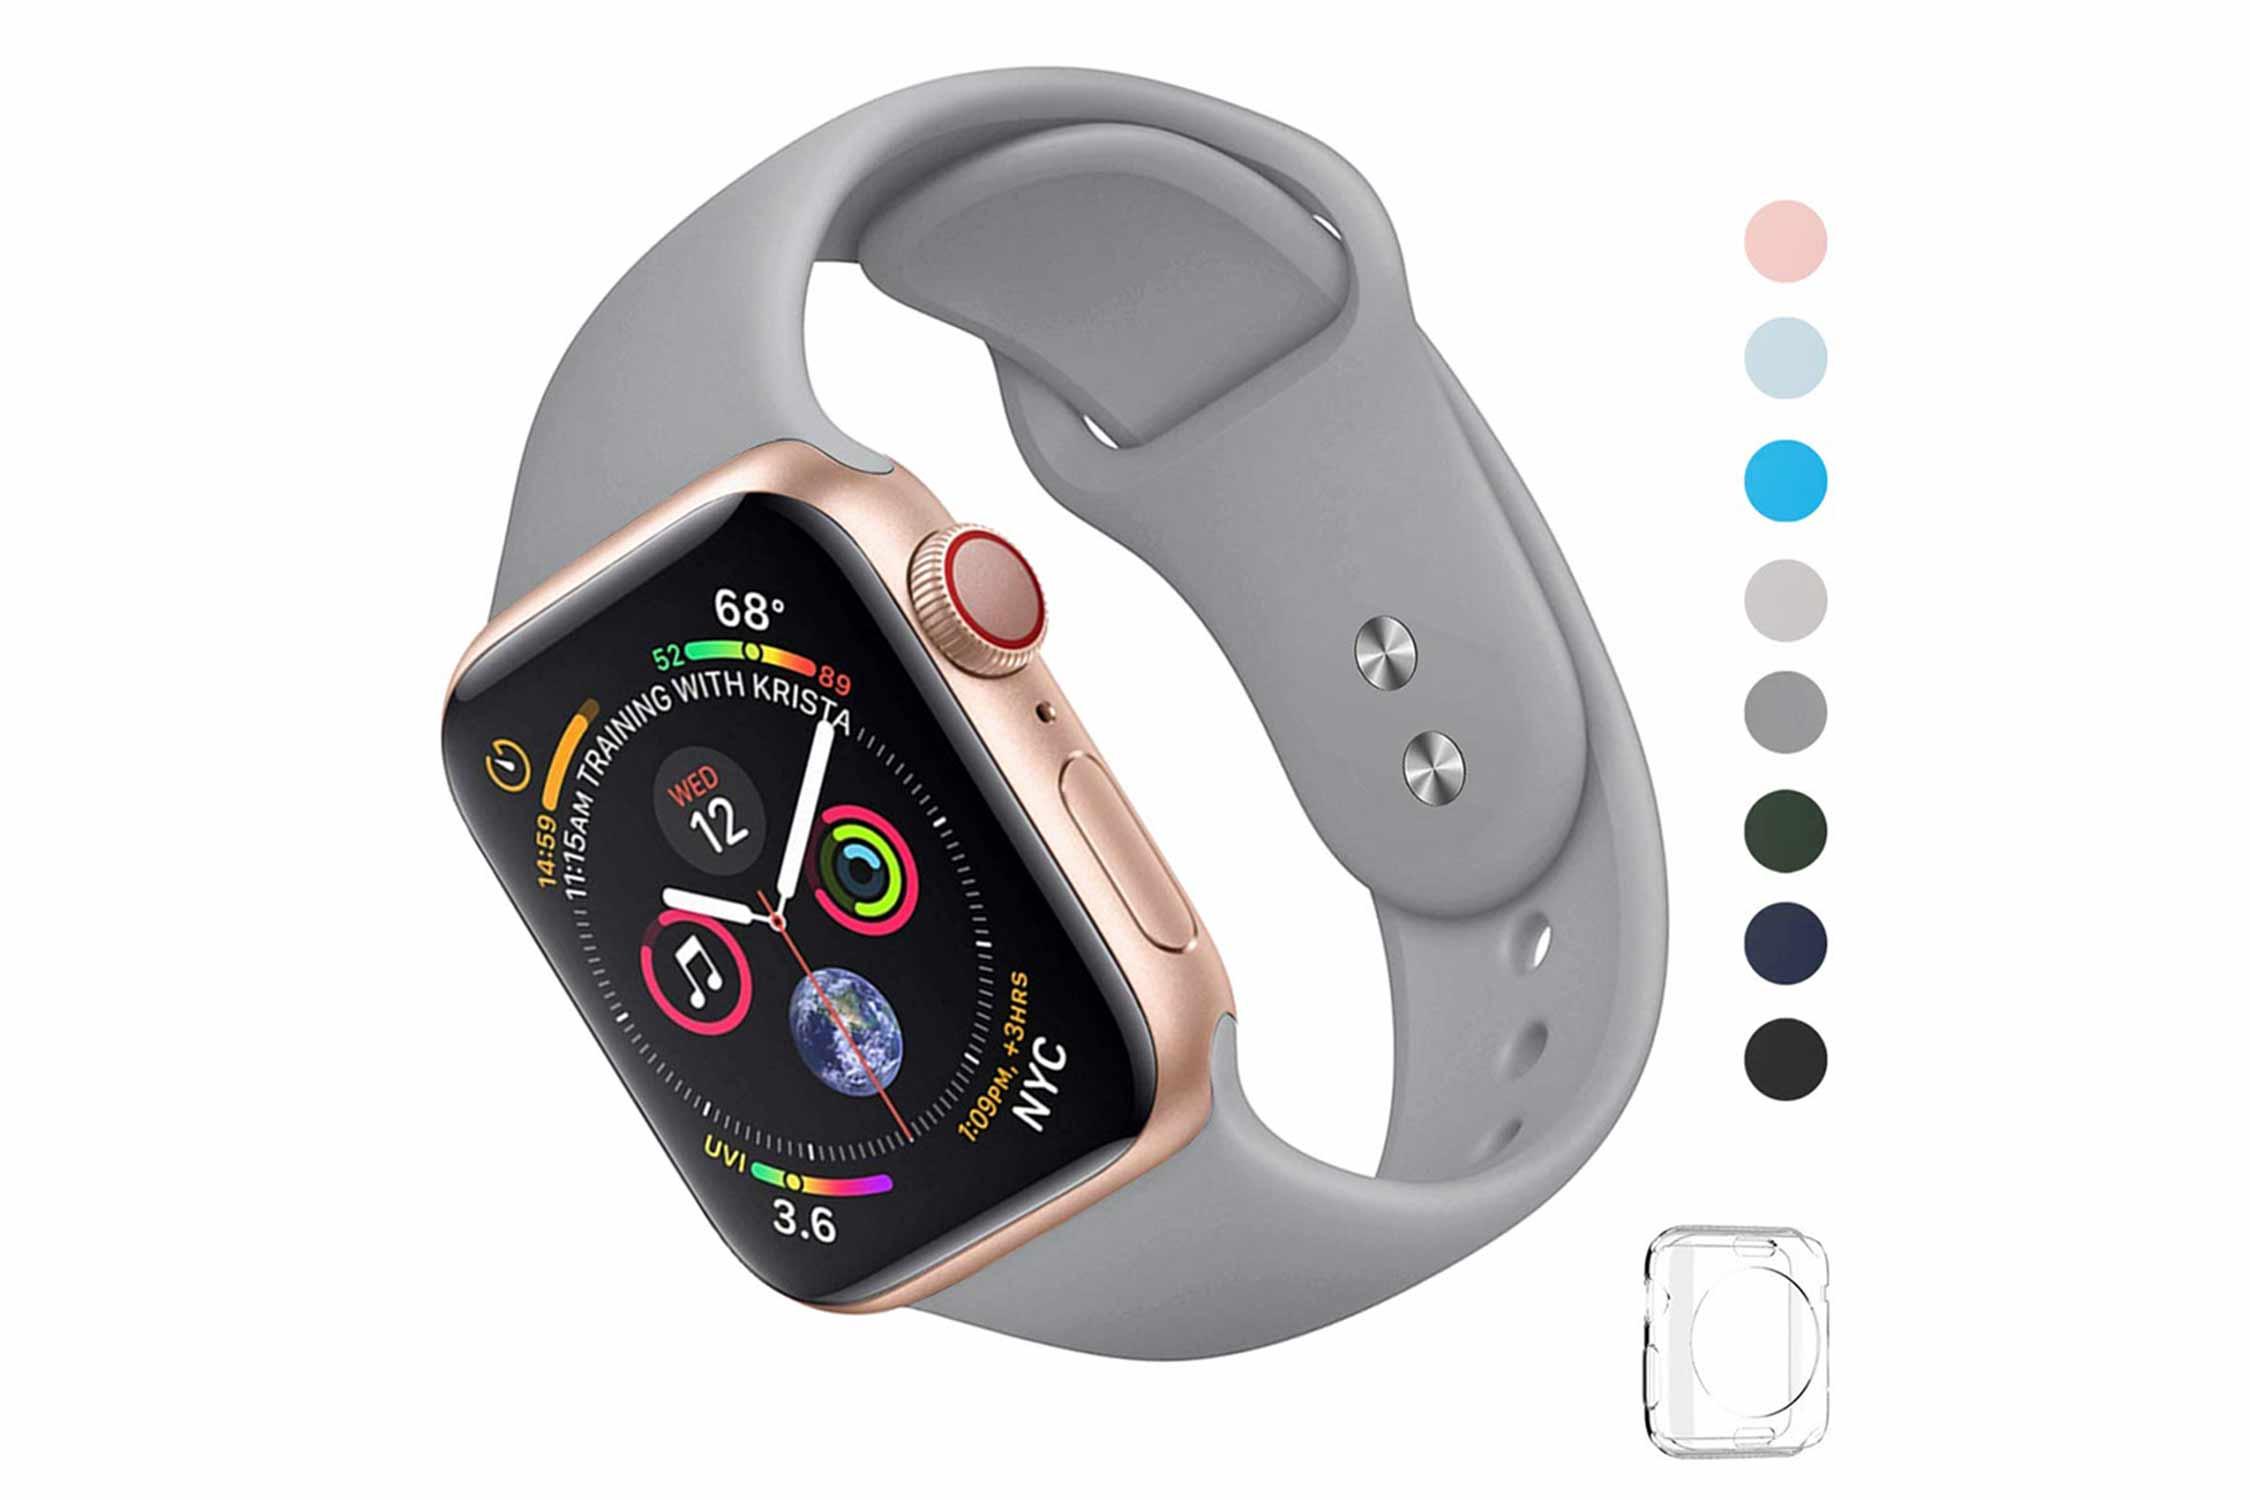 WFEAGL コンパチブル Apple Watch スポーツバンド